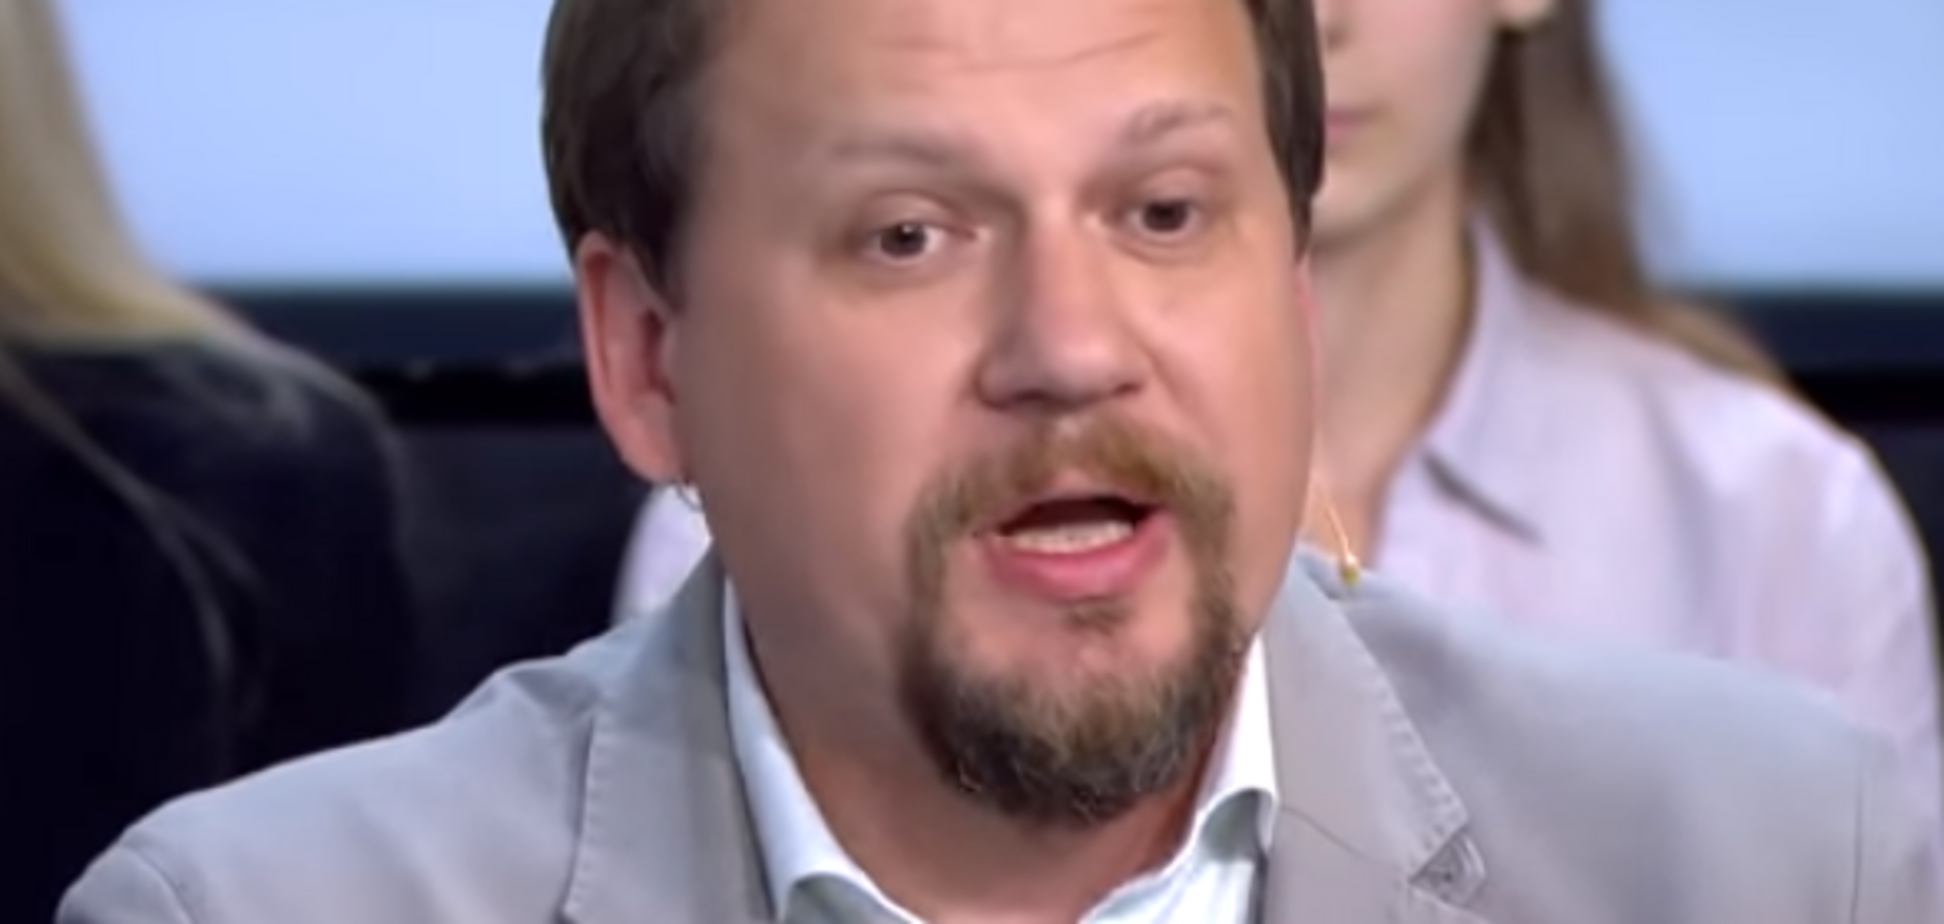 ''Назвали себе українцями!'' Голос ''антимайдану'' впав у ностальгію за СРСР